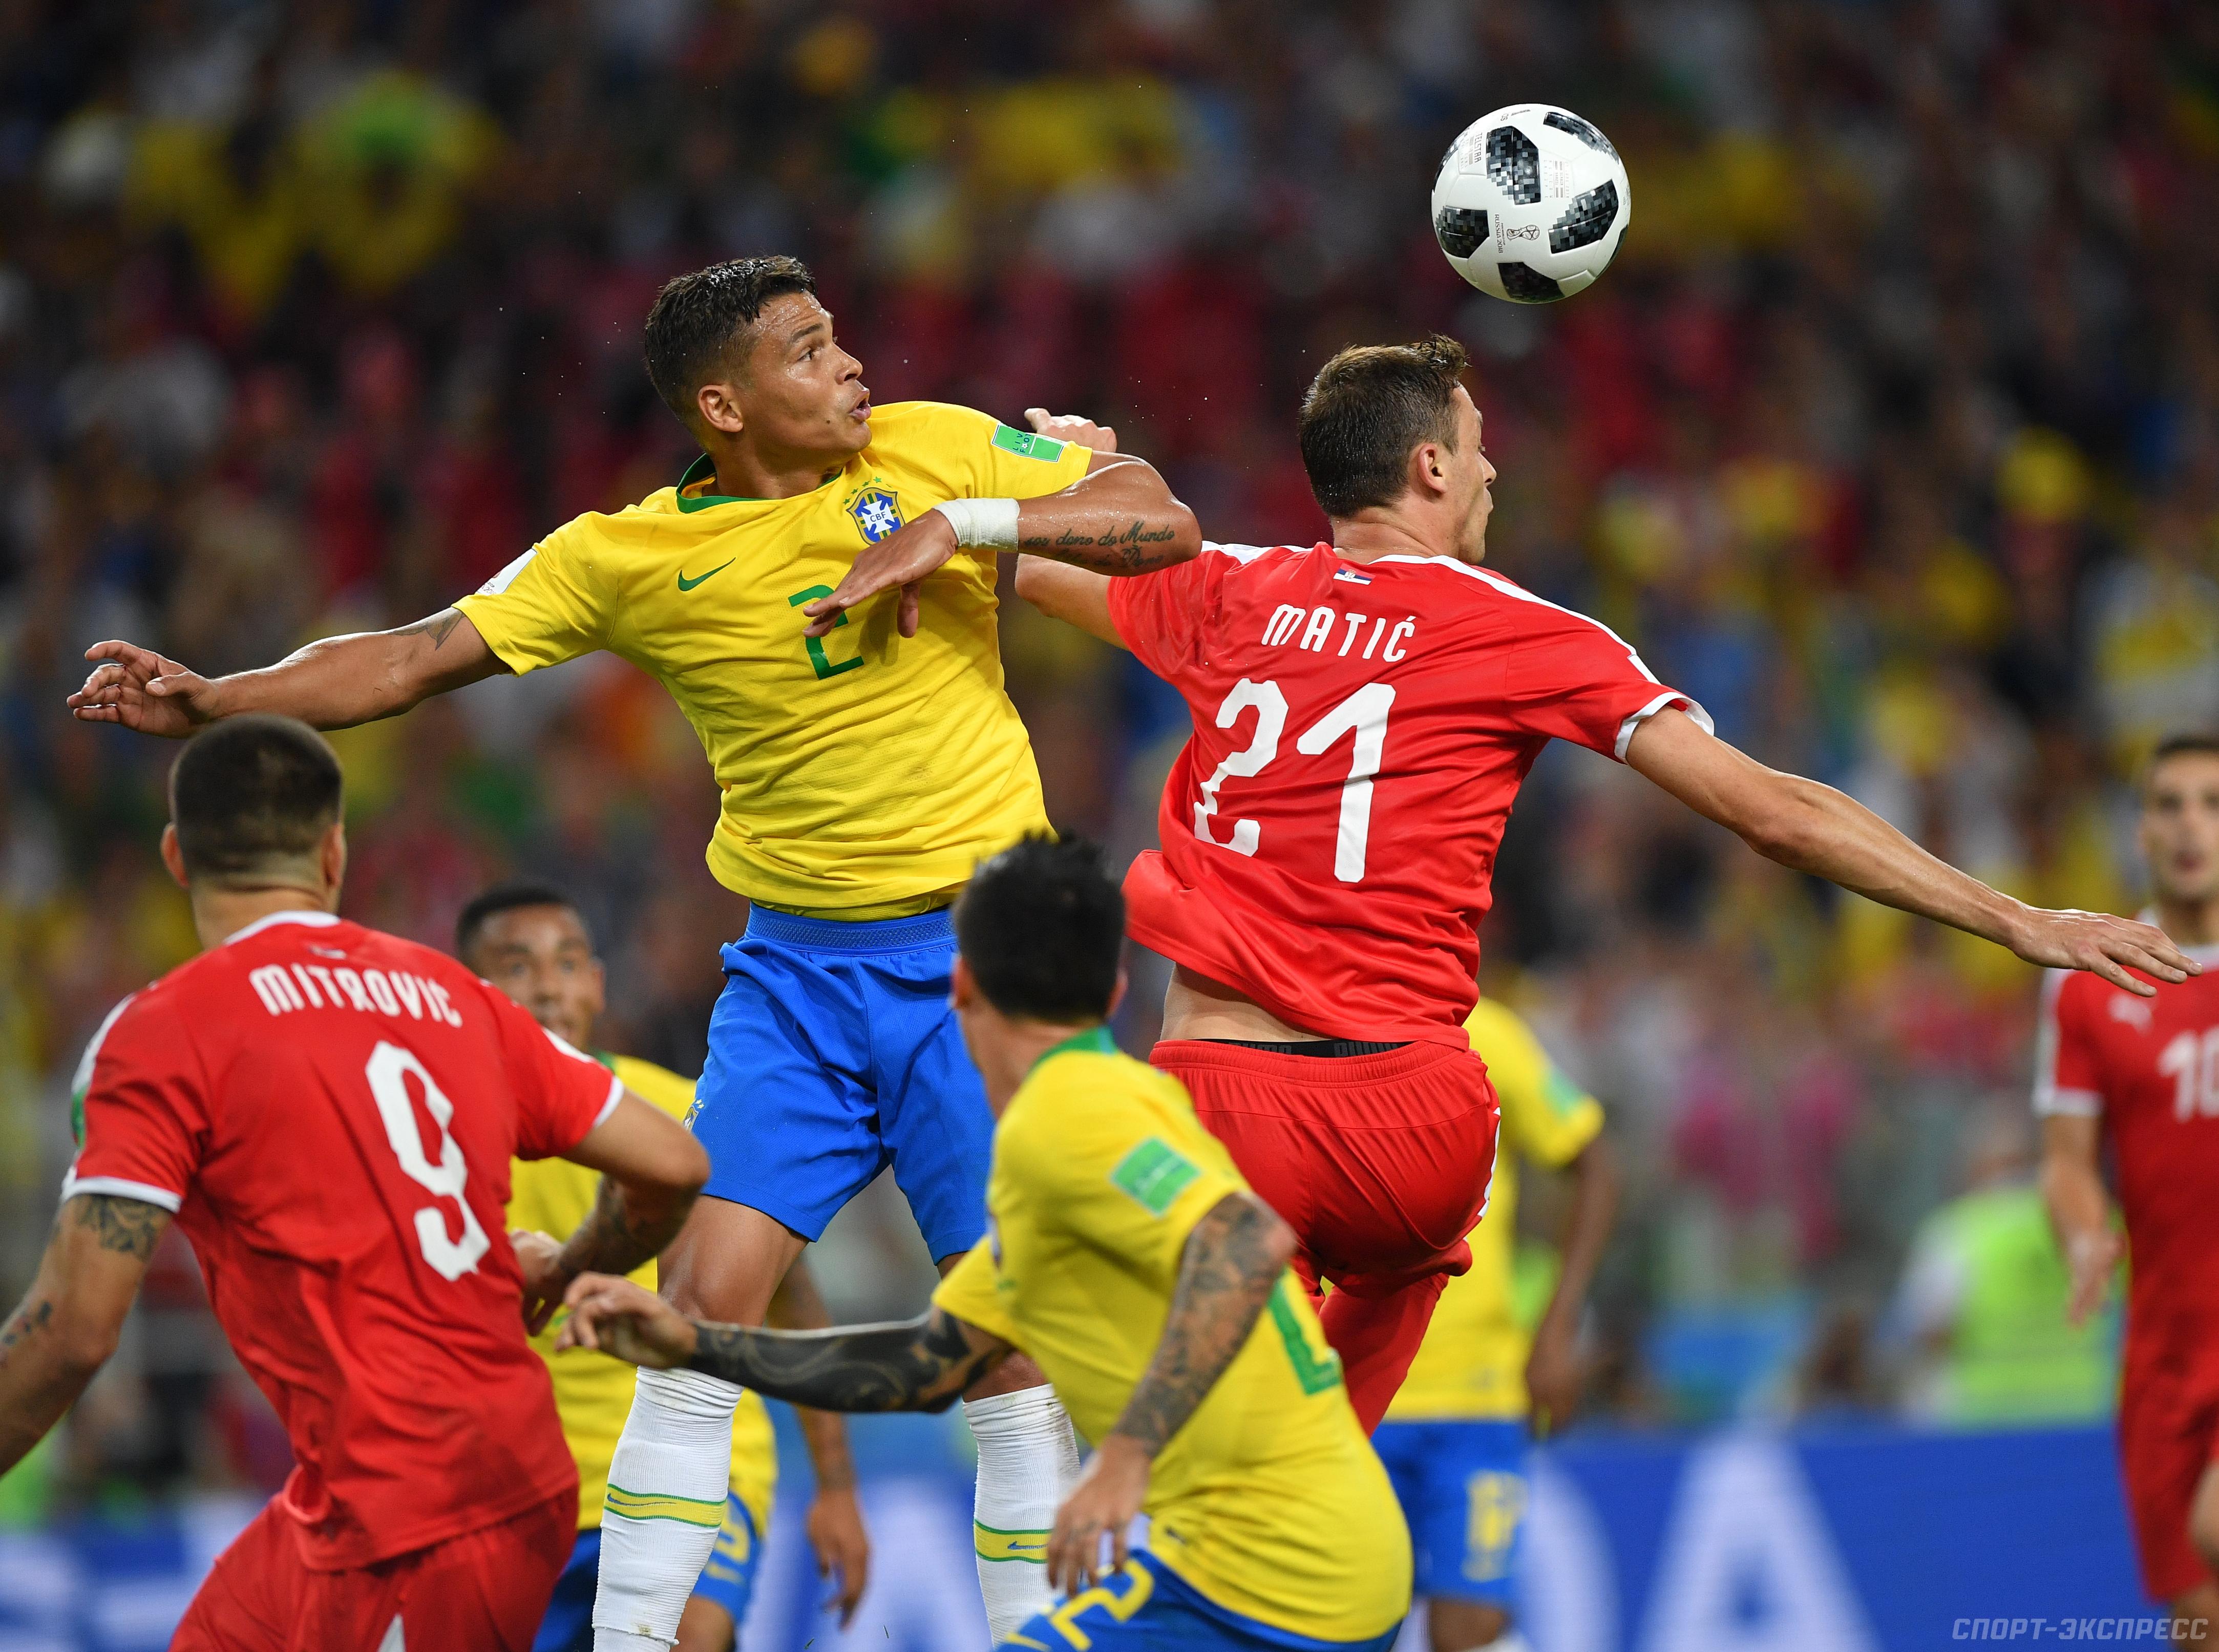 Прогноз на матч Бразилия - Хорватия: виктория останется за бразильцами